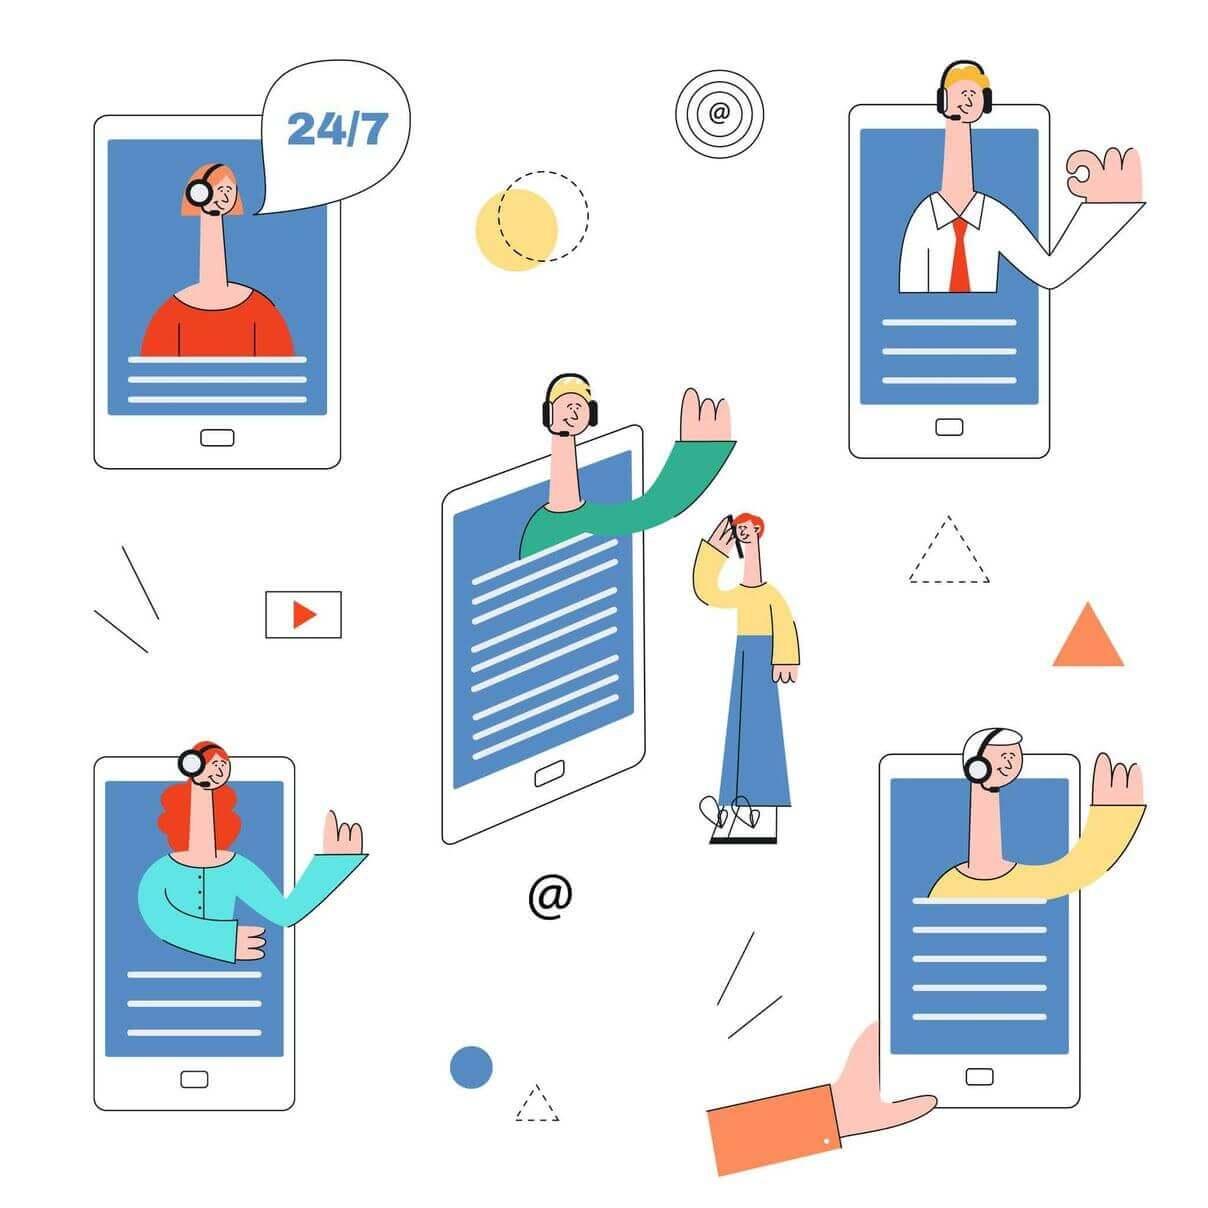 Conversational Intelligence Software 2021: Buyers Guide